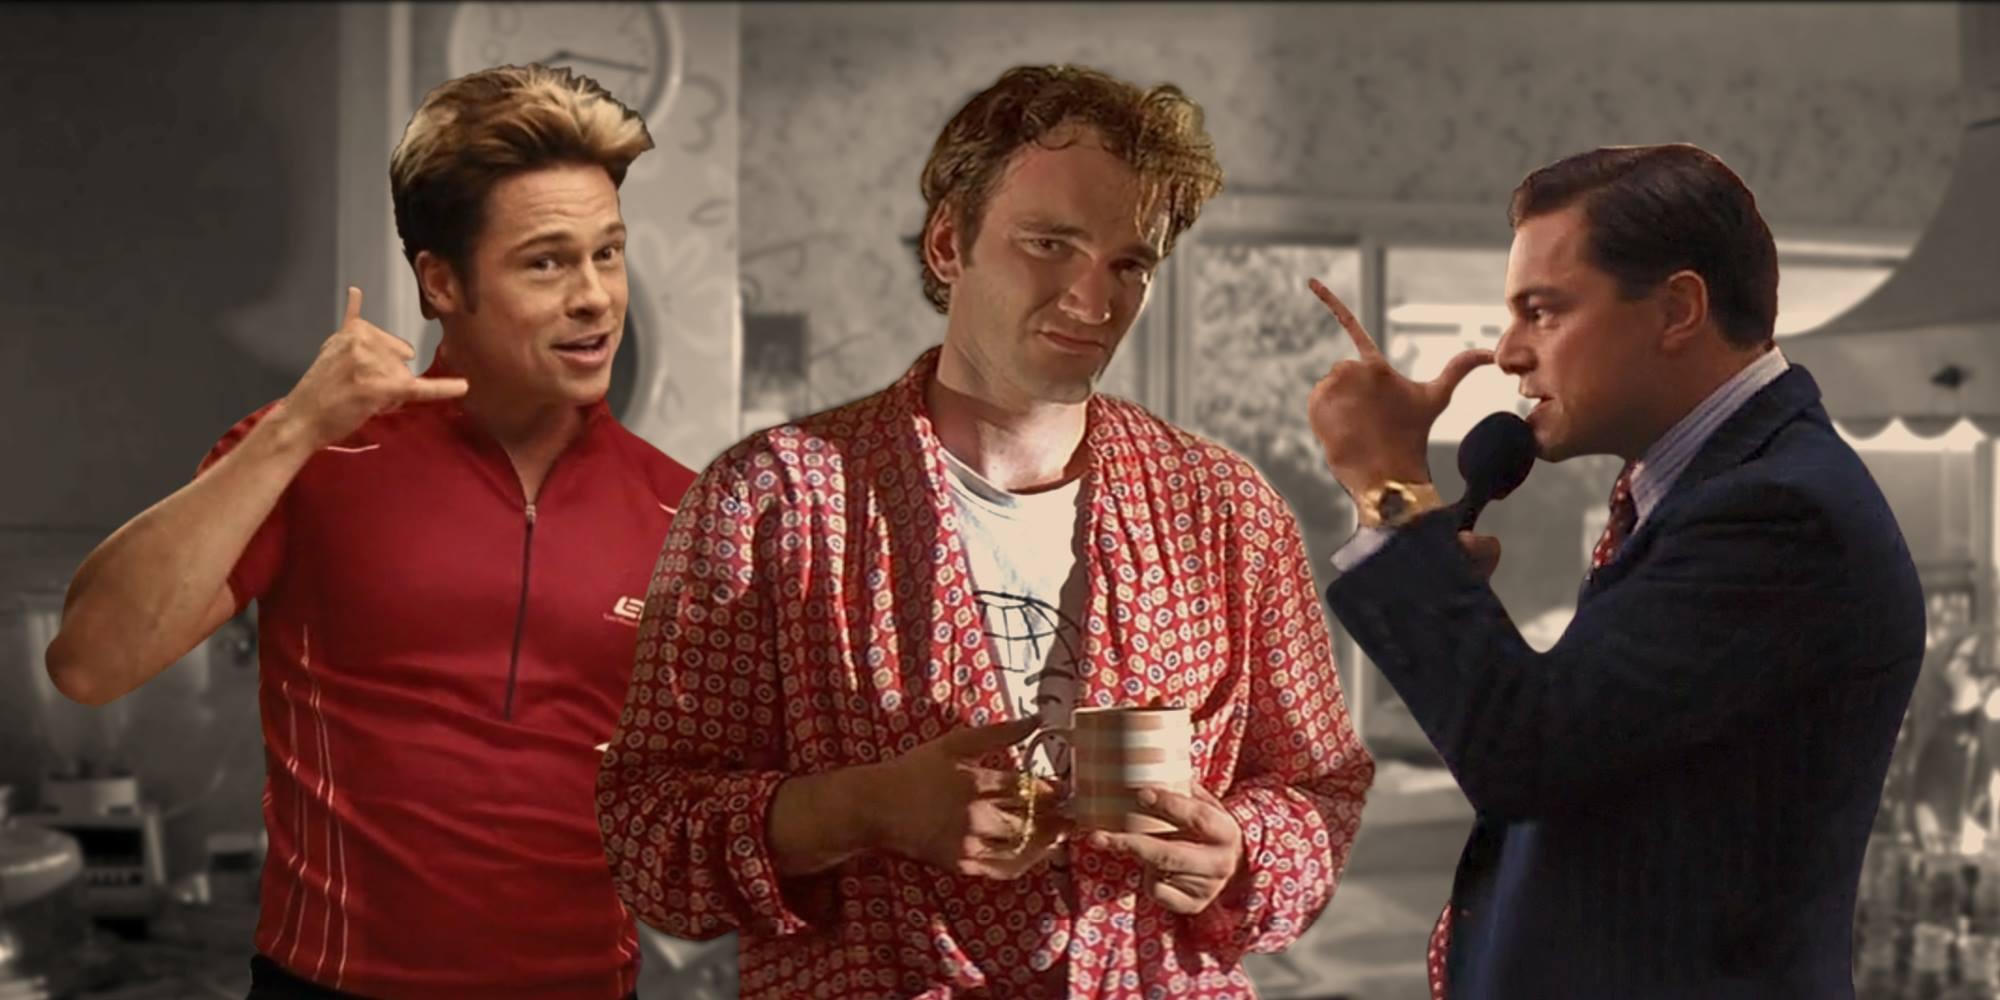 Брэд Питт, Леонардо Ди Каприо и Квентин Тарантино объединятся ради съемок нового фильма